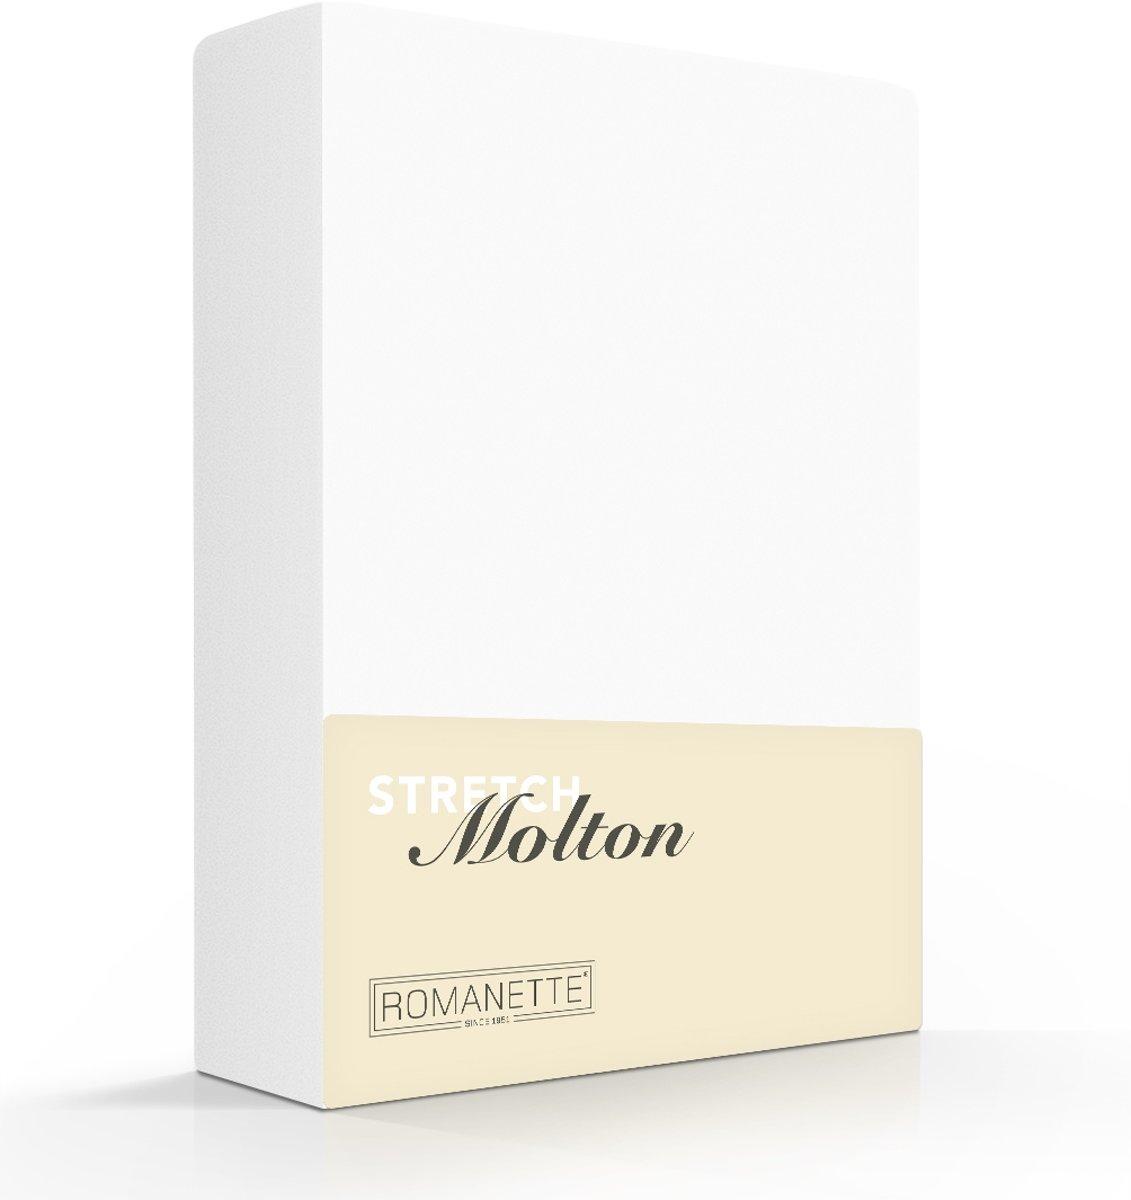 Romanette molton stretch hoeslaken - Wit - 2-persoons (130/140/150x200/220 cm) kopen